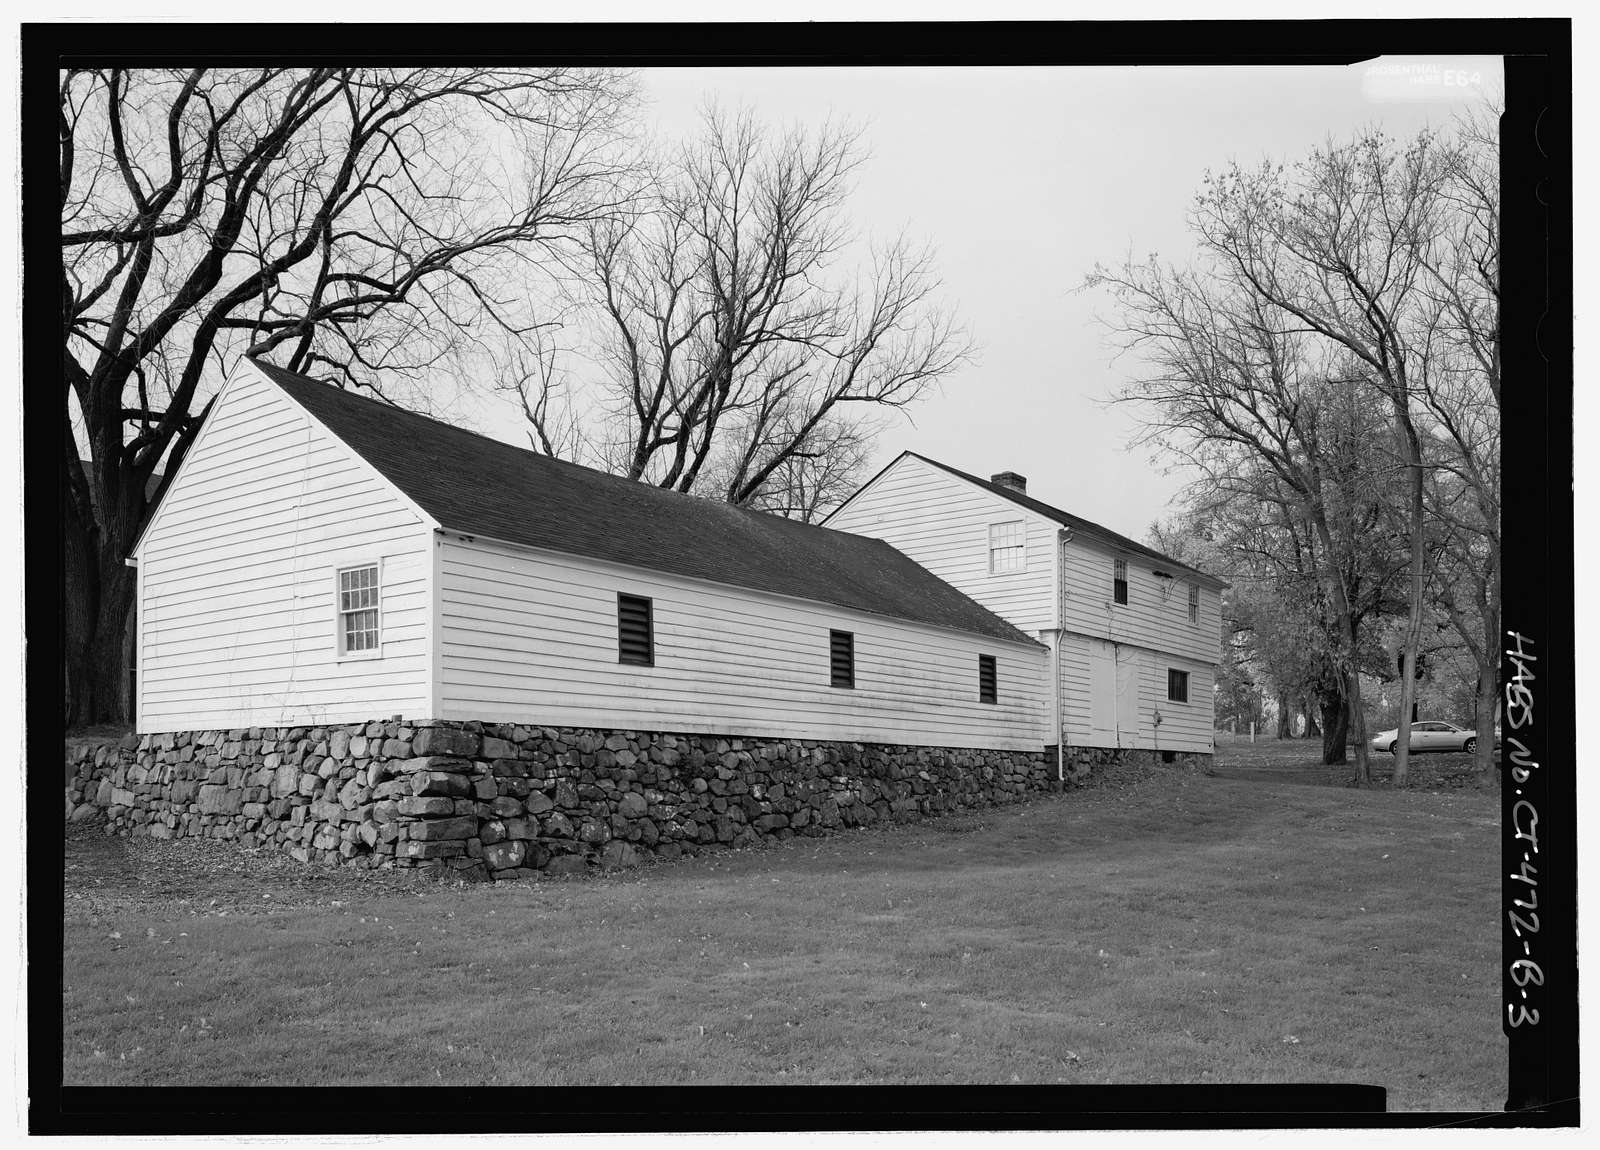 Hill-Stead, Farm Complex, 35 Mountain Road, Farmington, Hartford County, CT